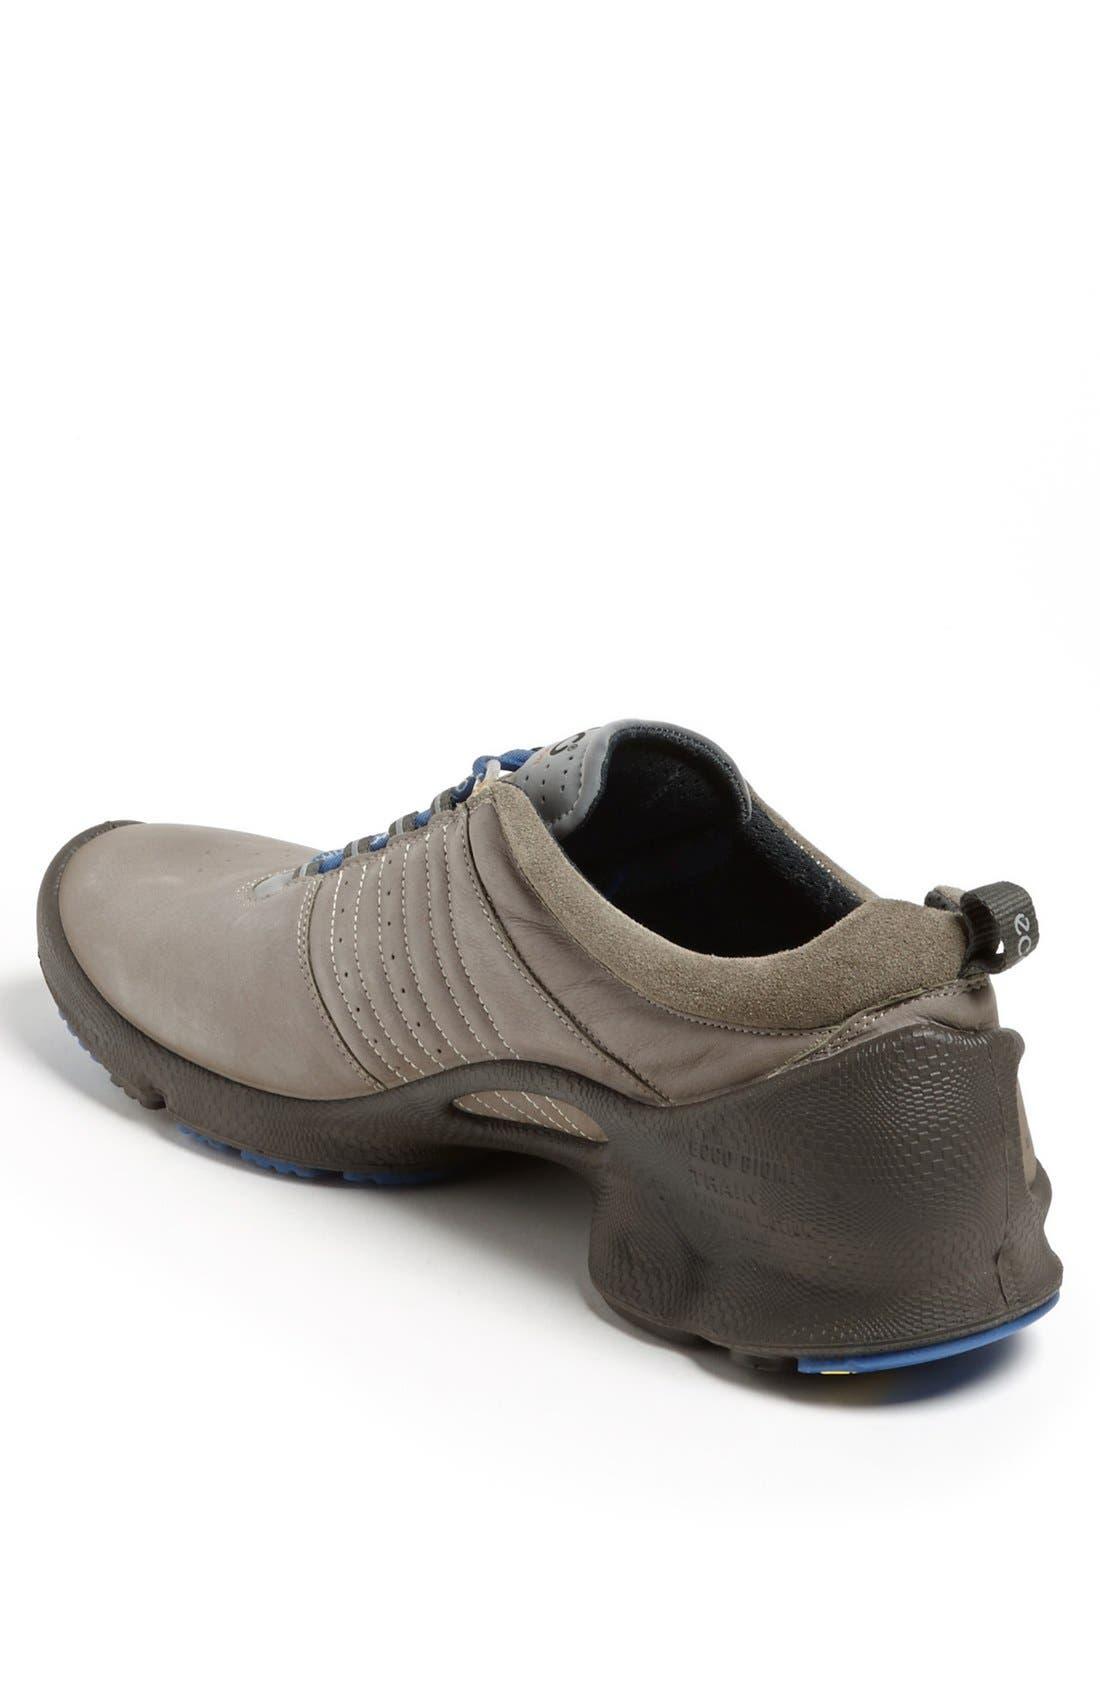 Alternate Image 2  - ECCO 'Biom Training 1.1' Fitness Shoe (Men)